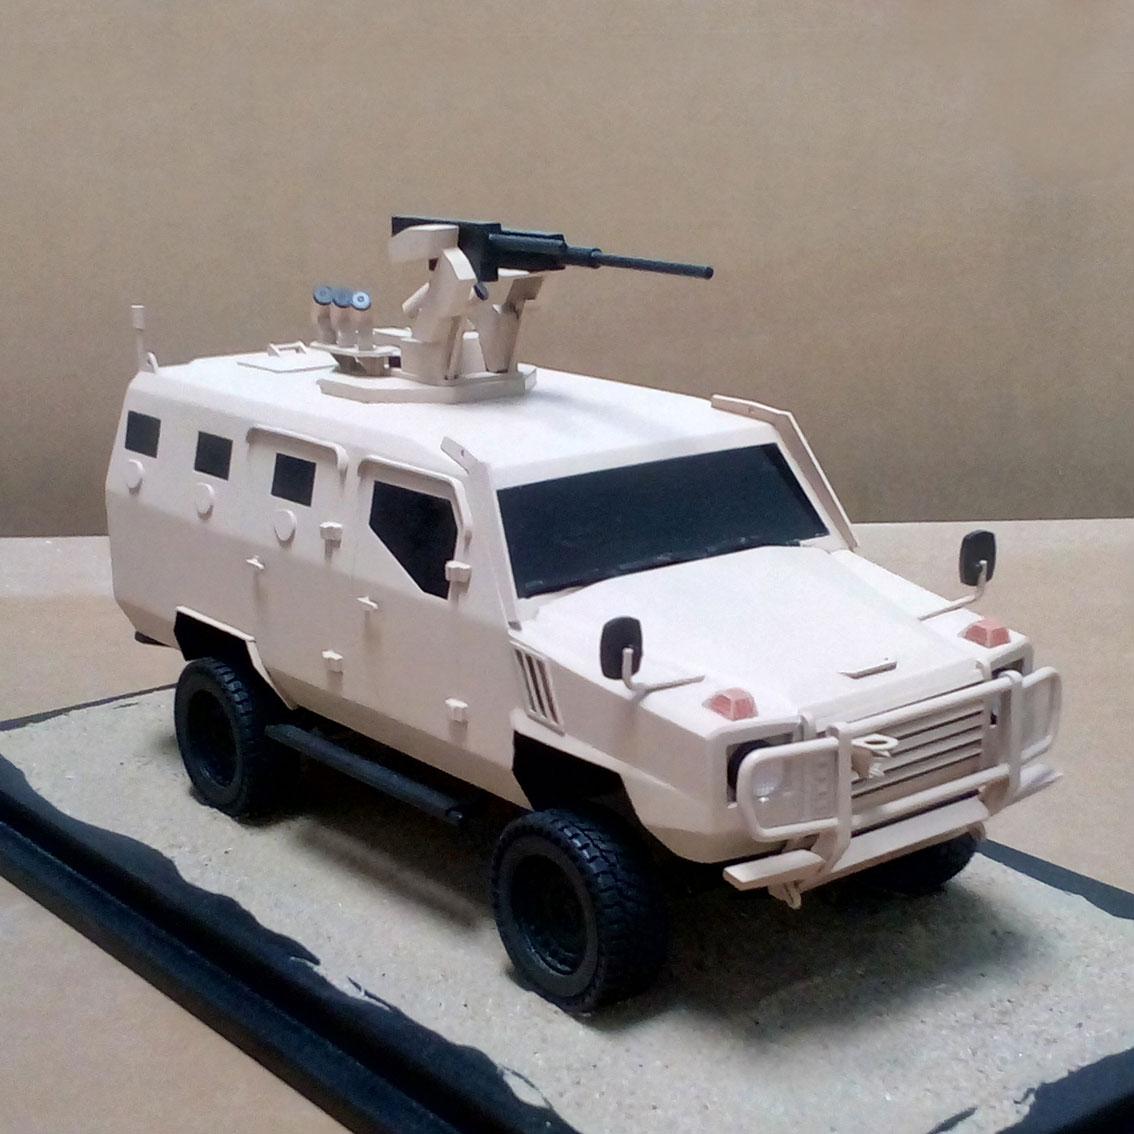 Scale Model - Vehicles - STI Multi Mission Vehicle